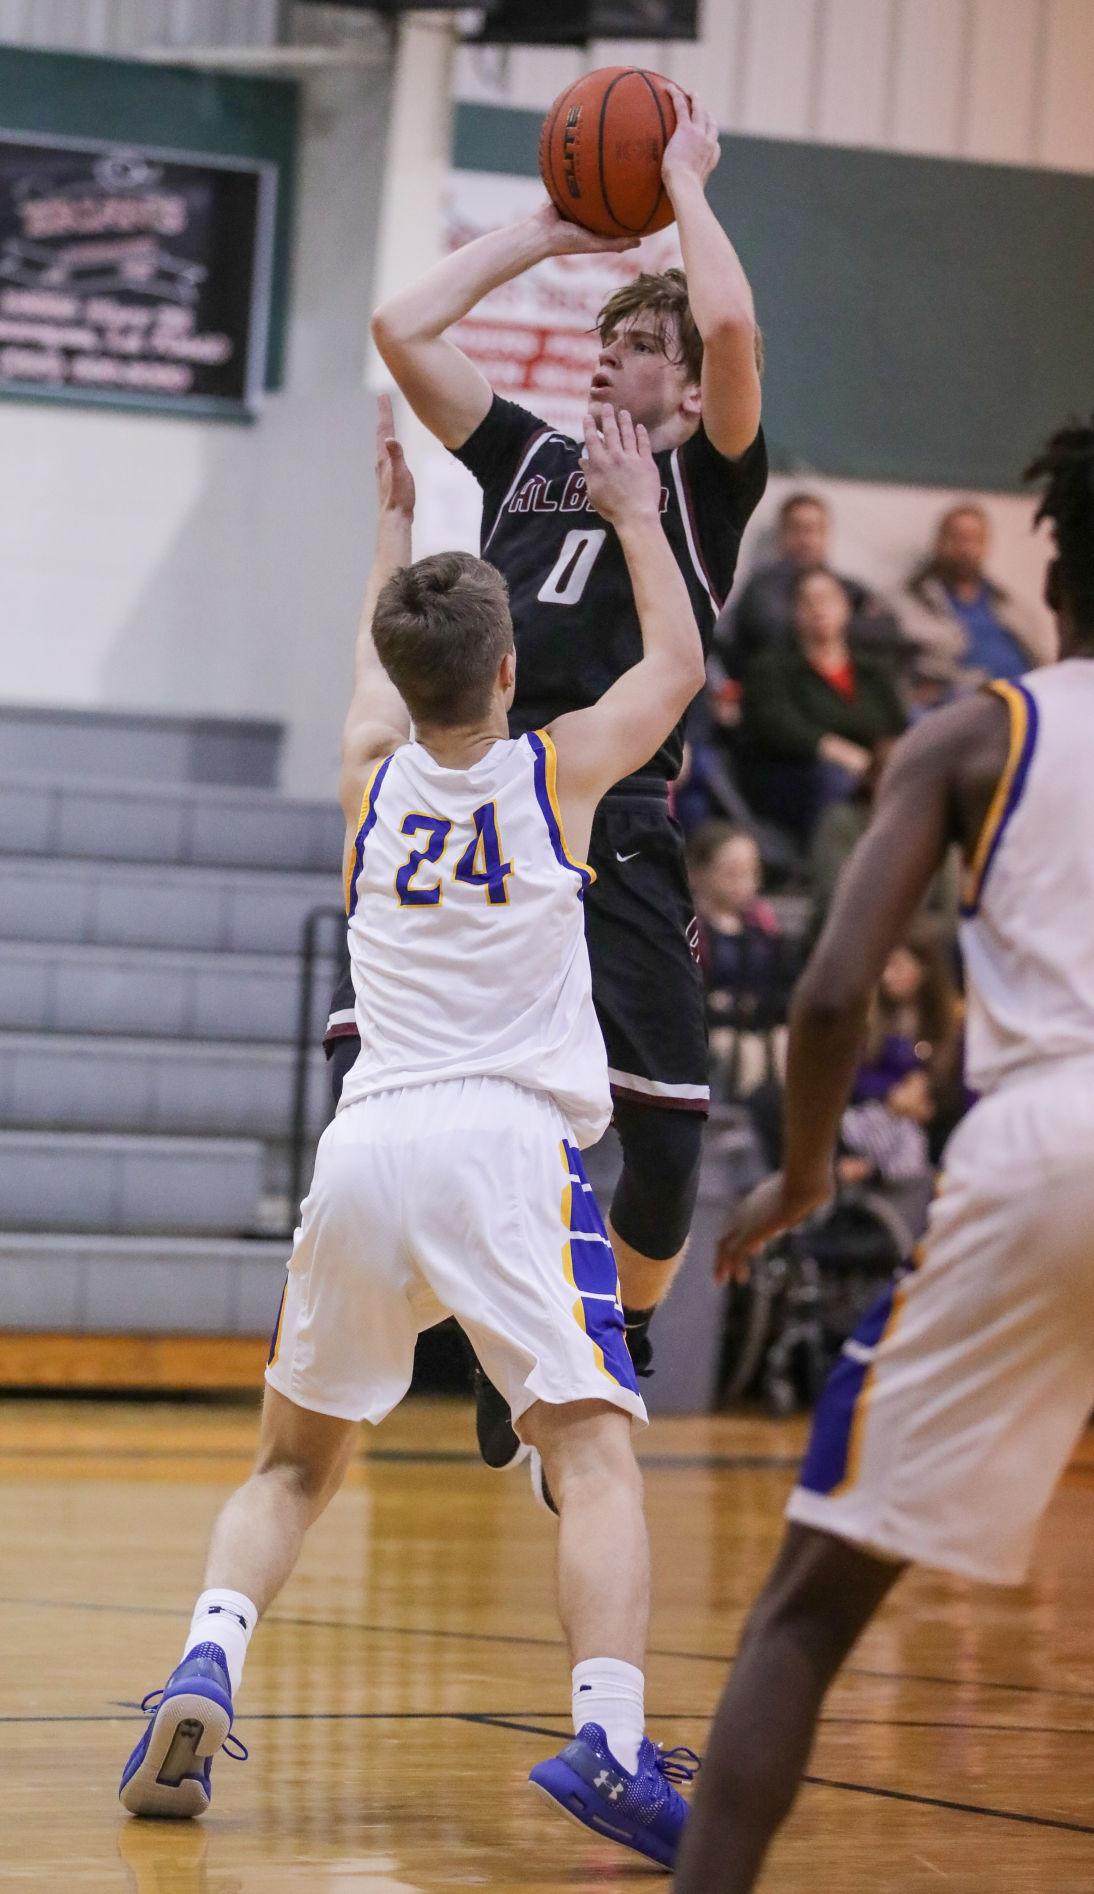 Albany vs Live Oak boys basketball Caleb Puma Halen Cox